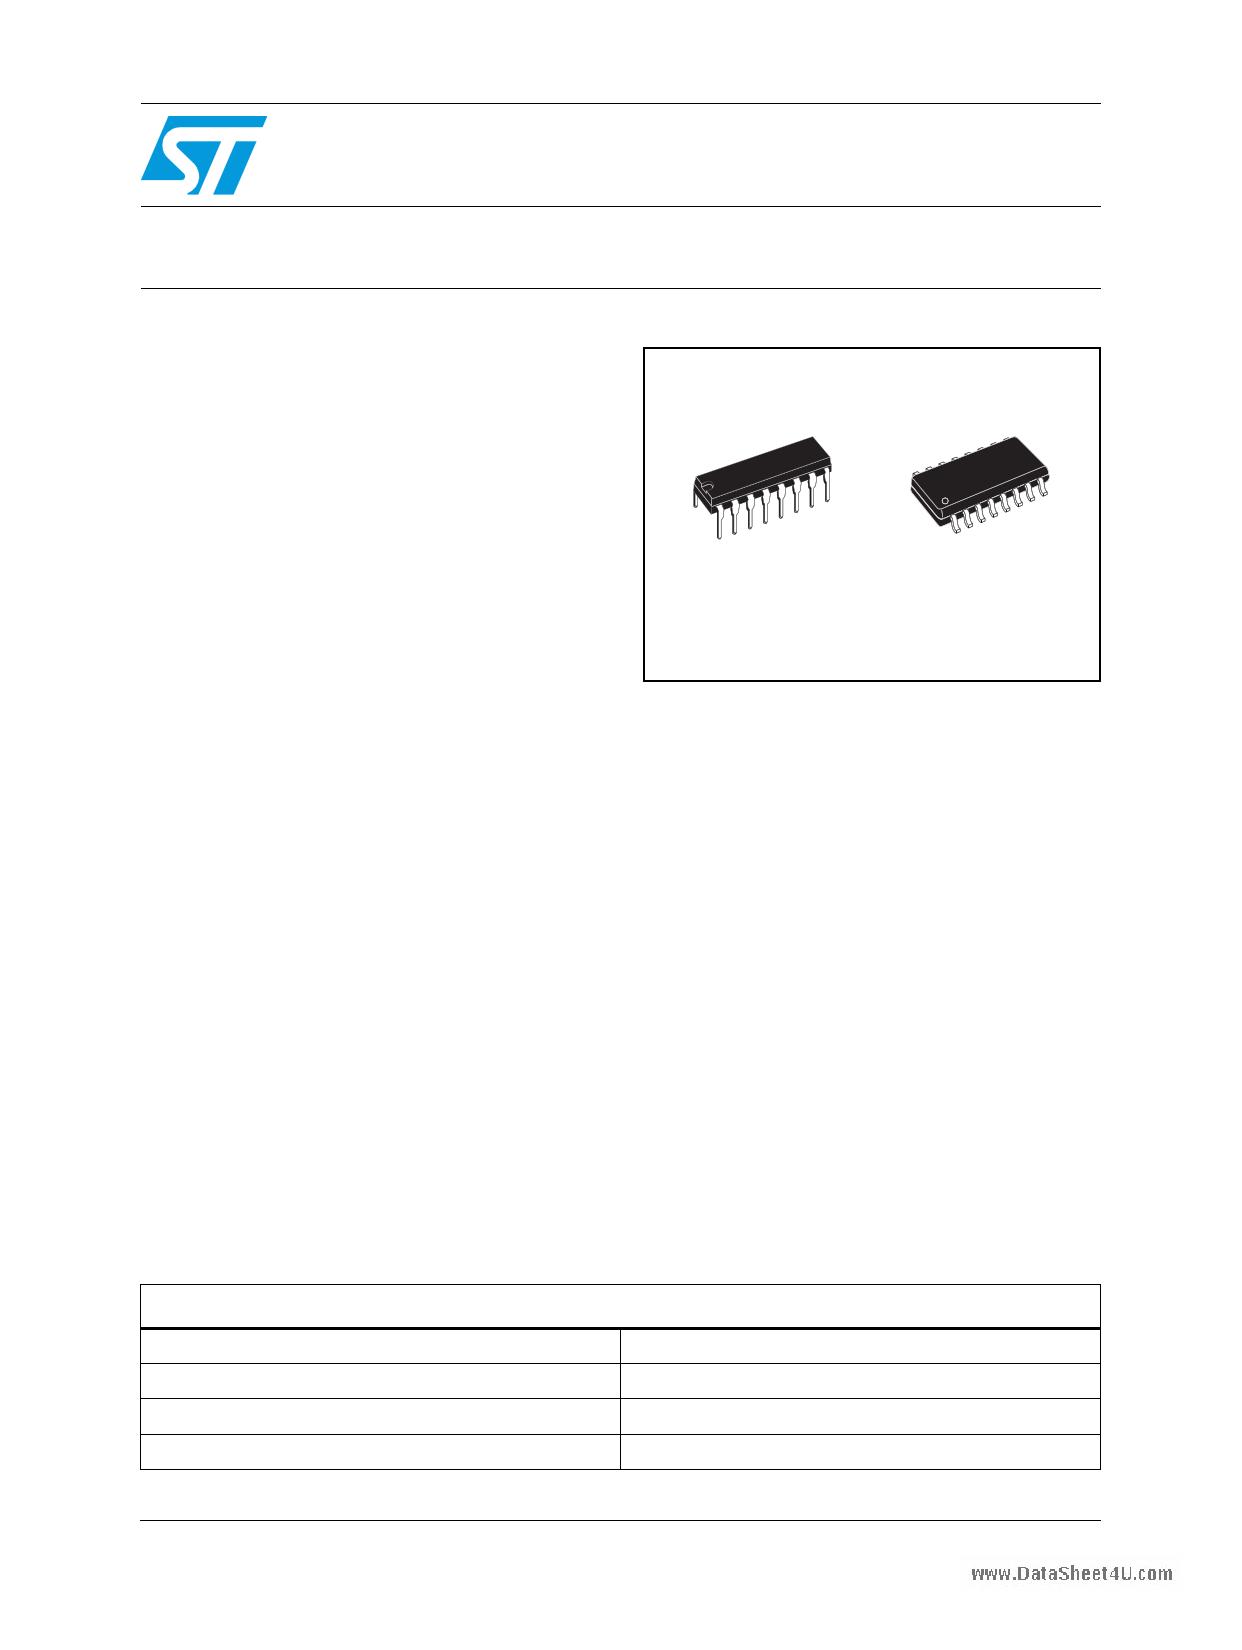 E-ULN200xD1 datasheet